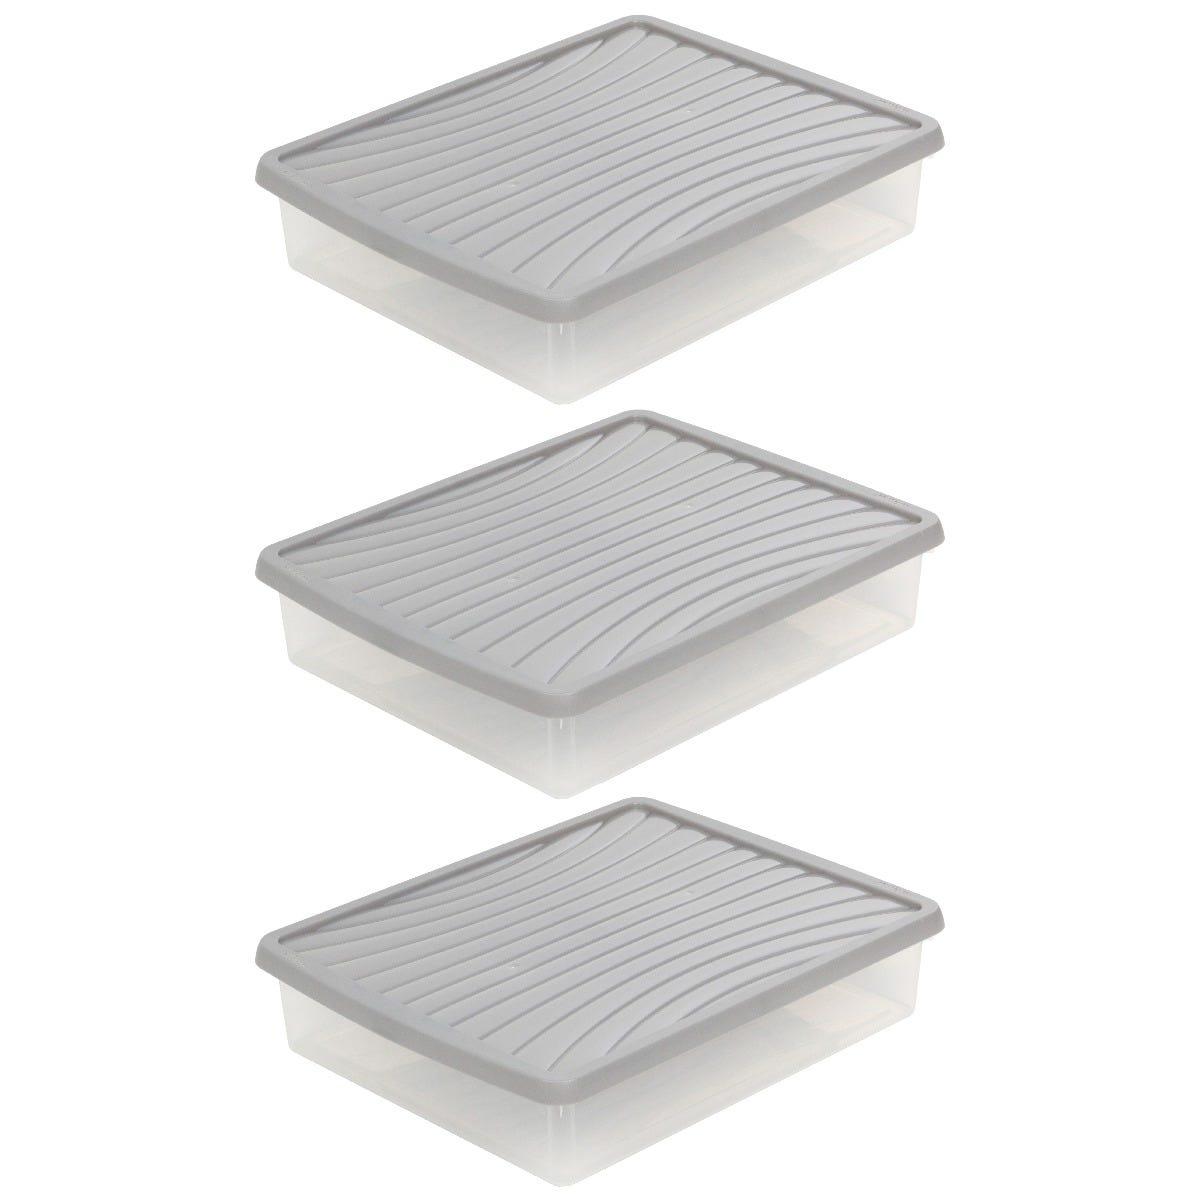 Wham Grey Storage Box & Lid 14.75L - Set of 3